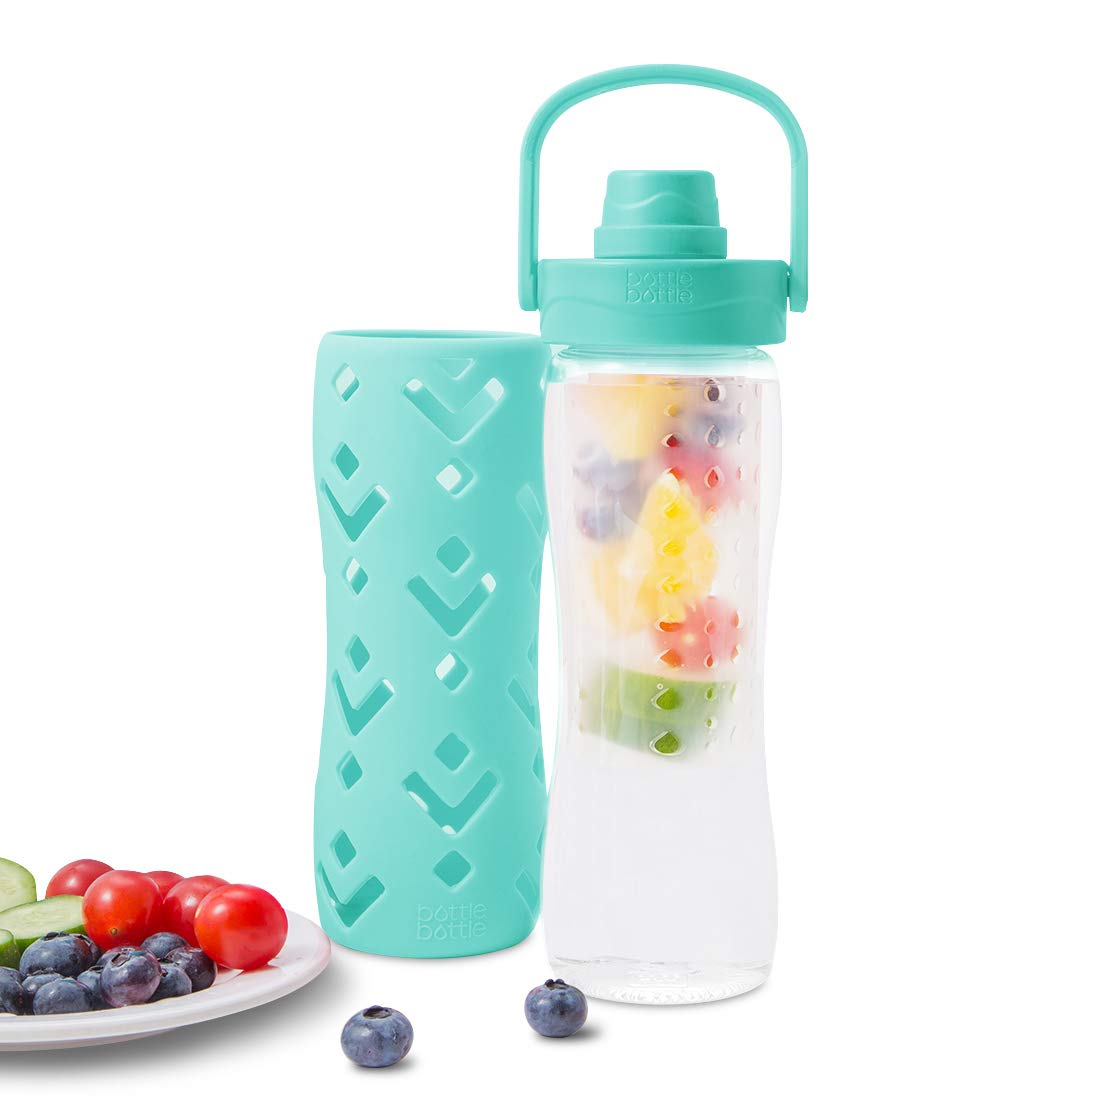 BPA Free Tritan bottlebottle Fruit Infuser Water Bottle with Handle Chug Lid Protective Insulated Sleeve 15.5oz